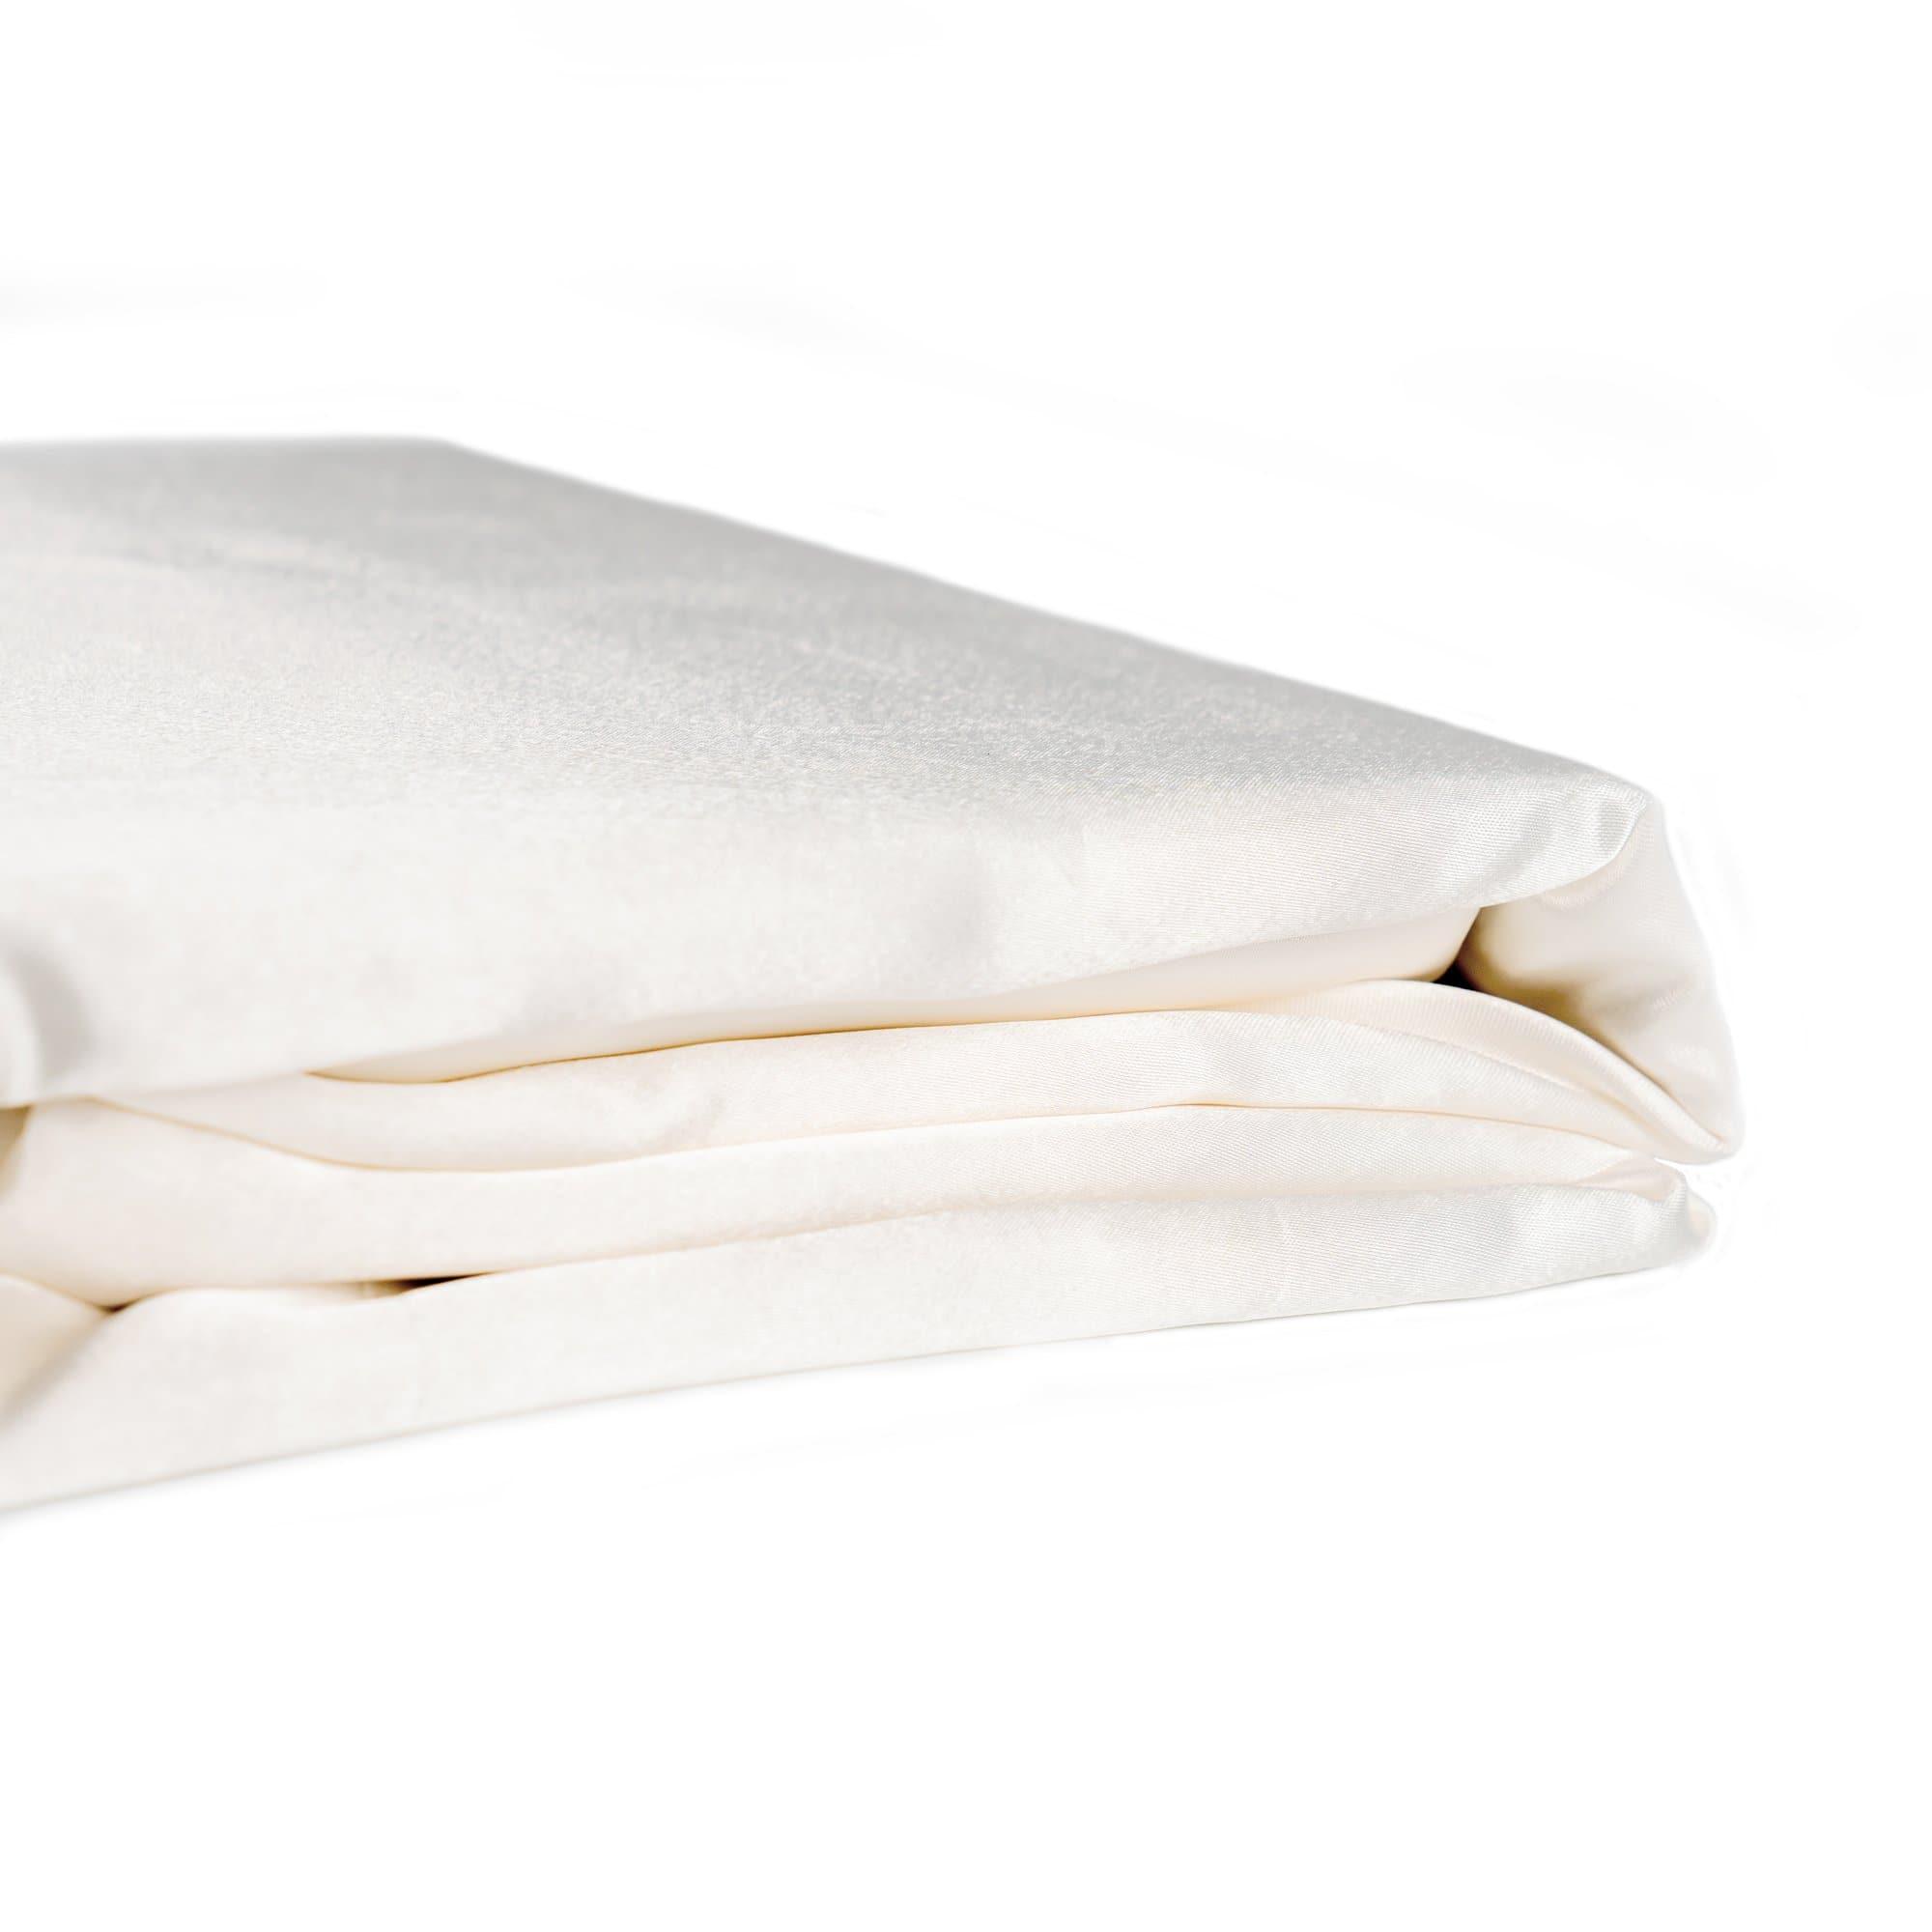 Soft Silk Feel IVORY//CREAM SATIN QUEEN Size Doona Duvet Quilt Cover Bedding Set